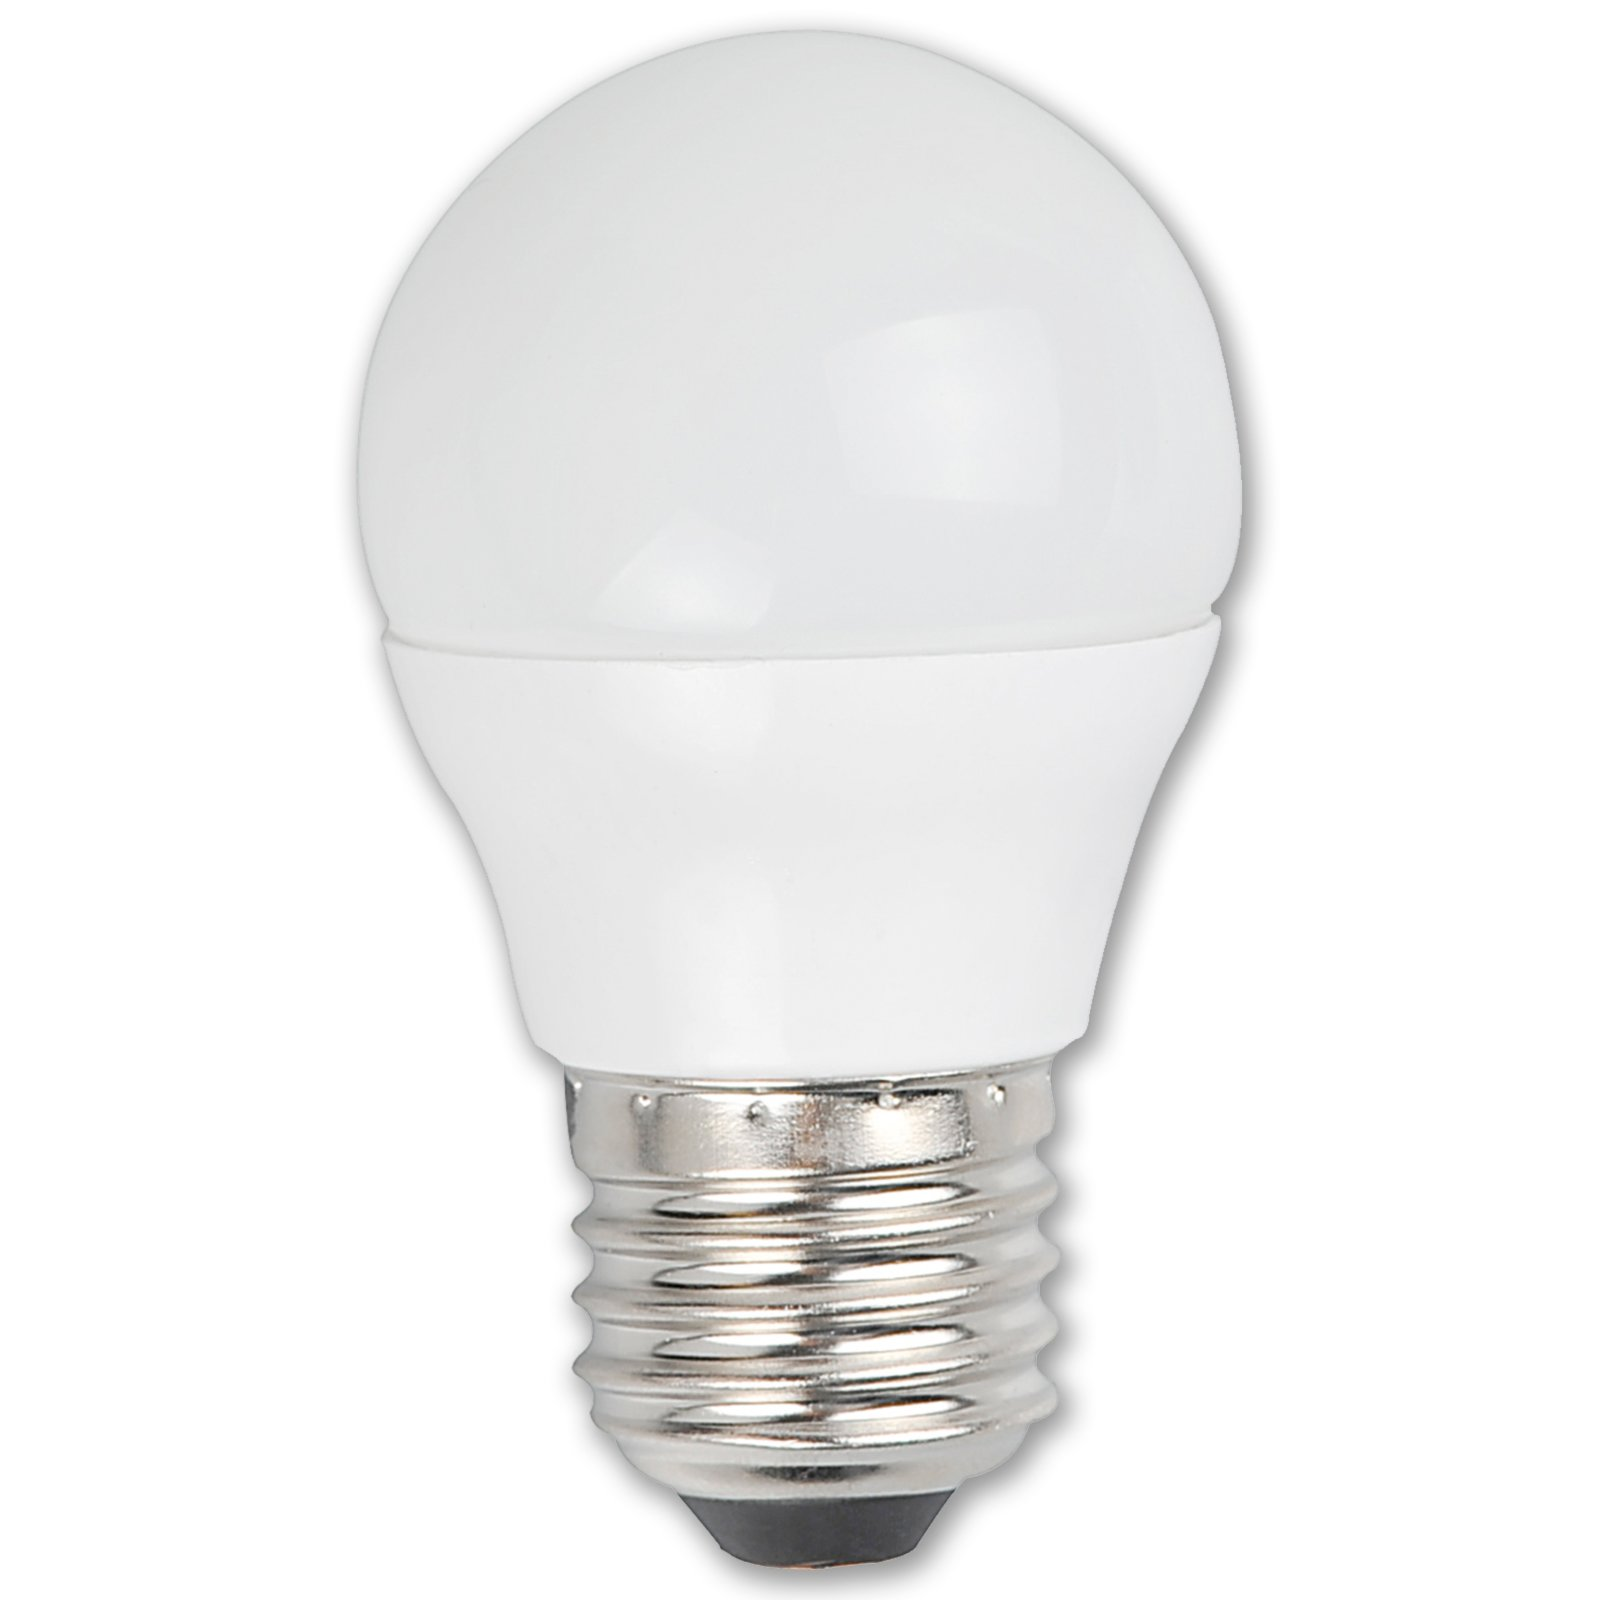 led leuchtmittel tropfen e27 6 watt warmwei led. Black Bedroom Furniture Sets. Home Design Ideas